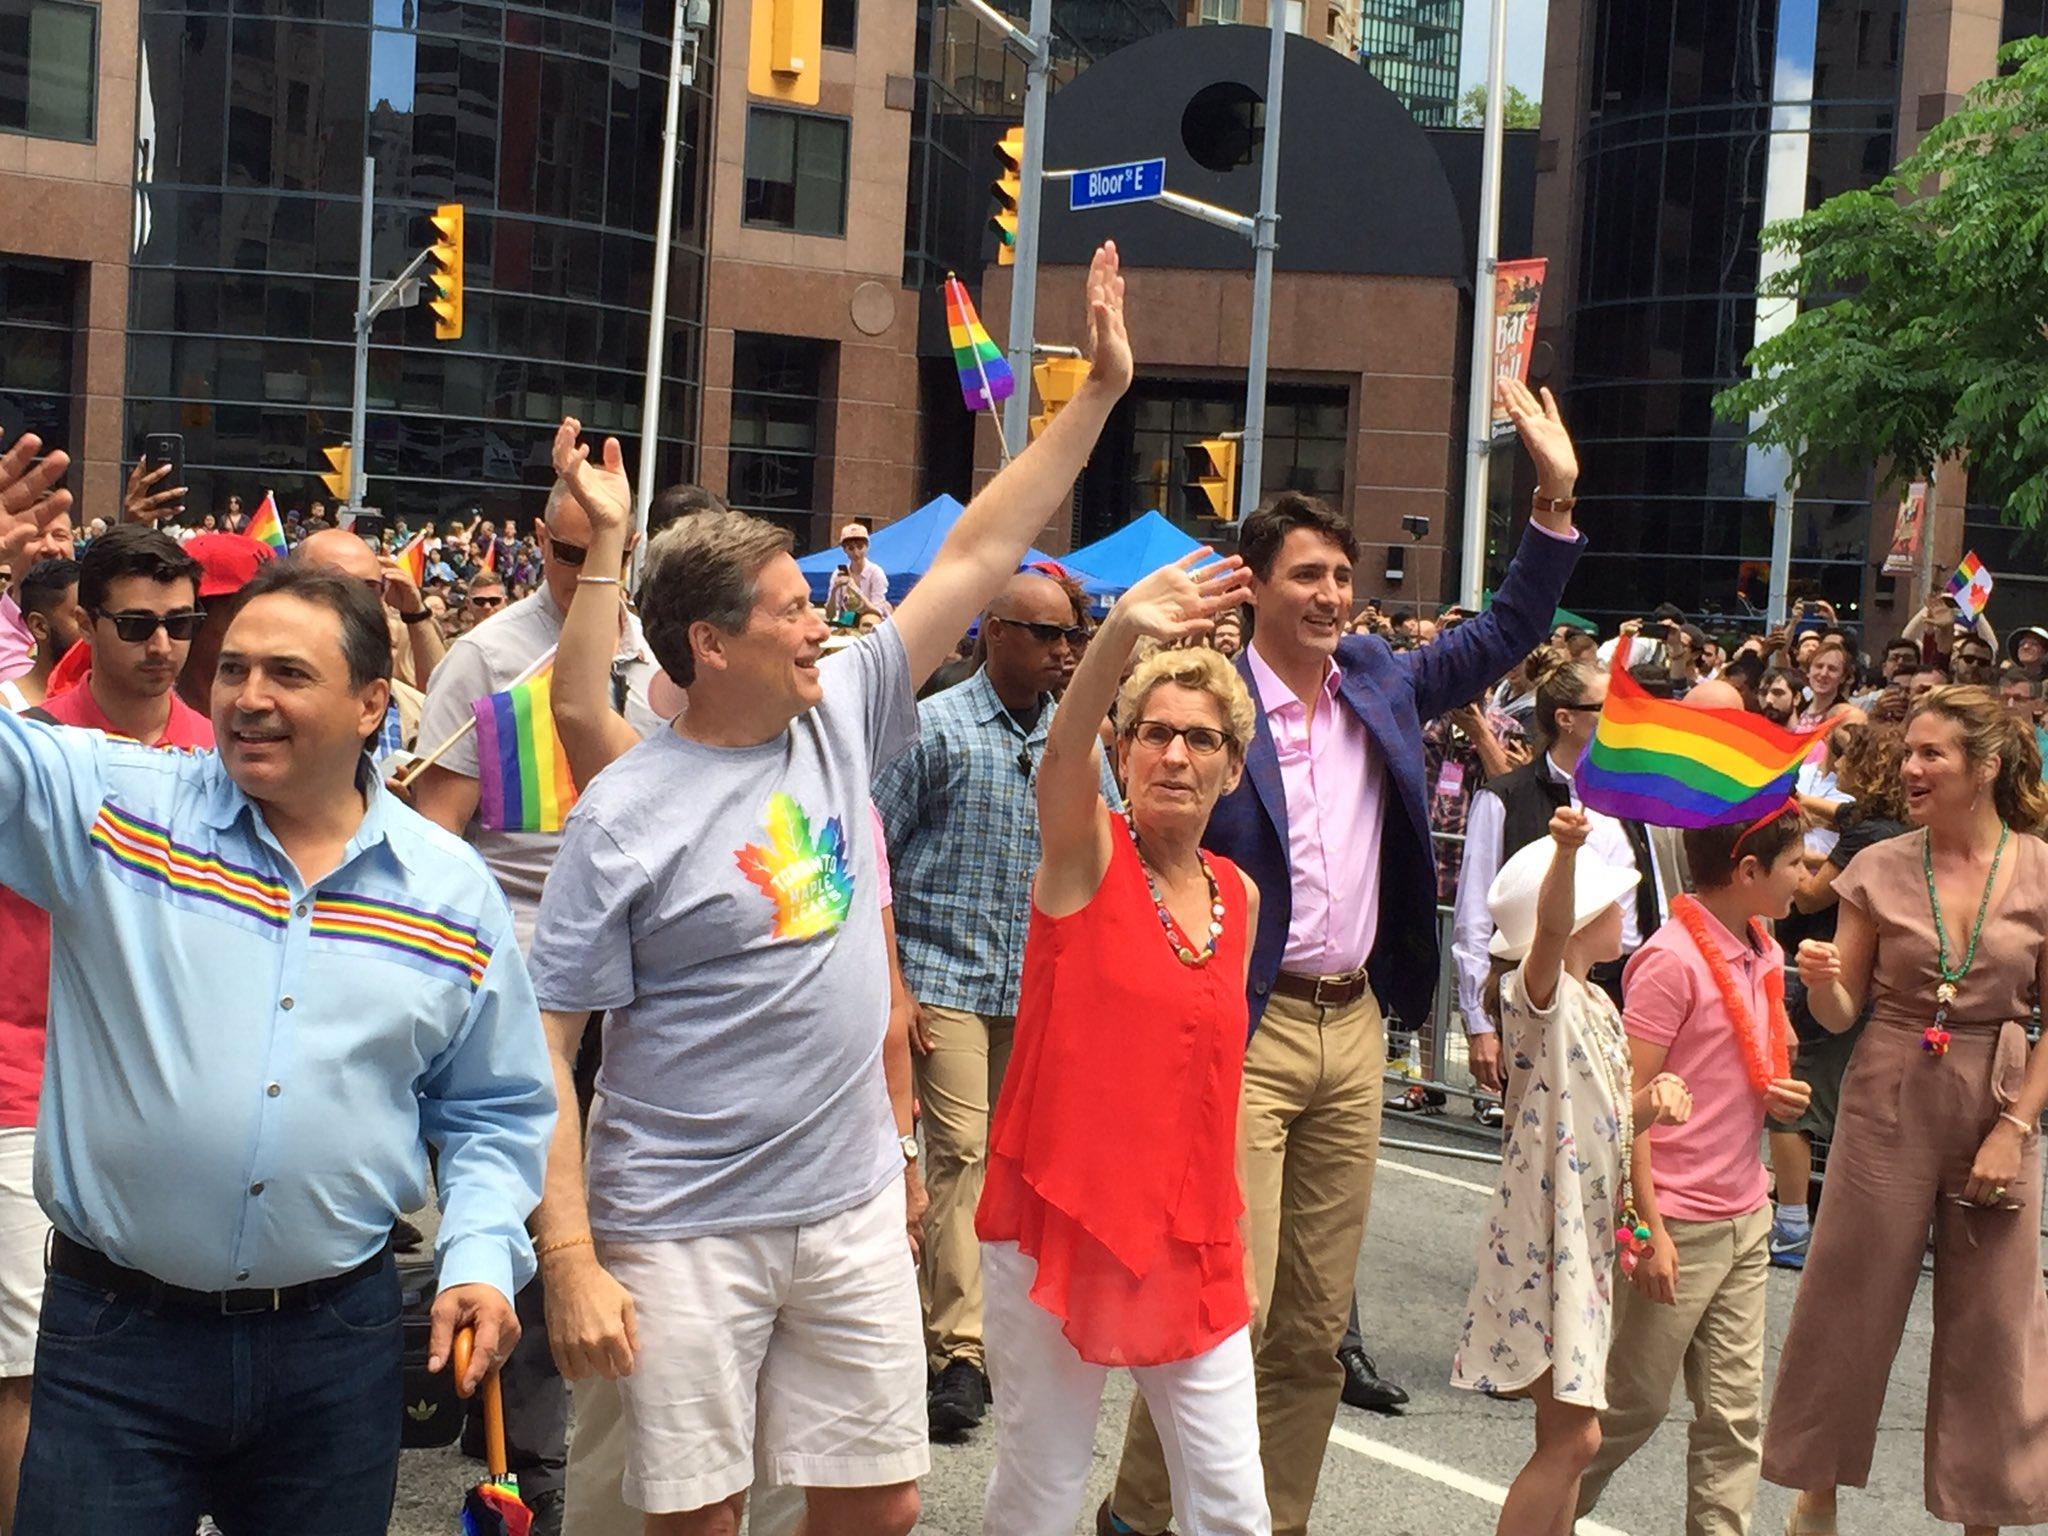 Pride_Parade_pic3.jpg